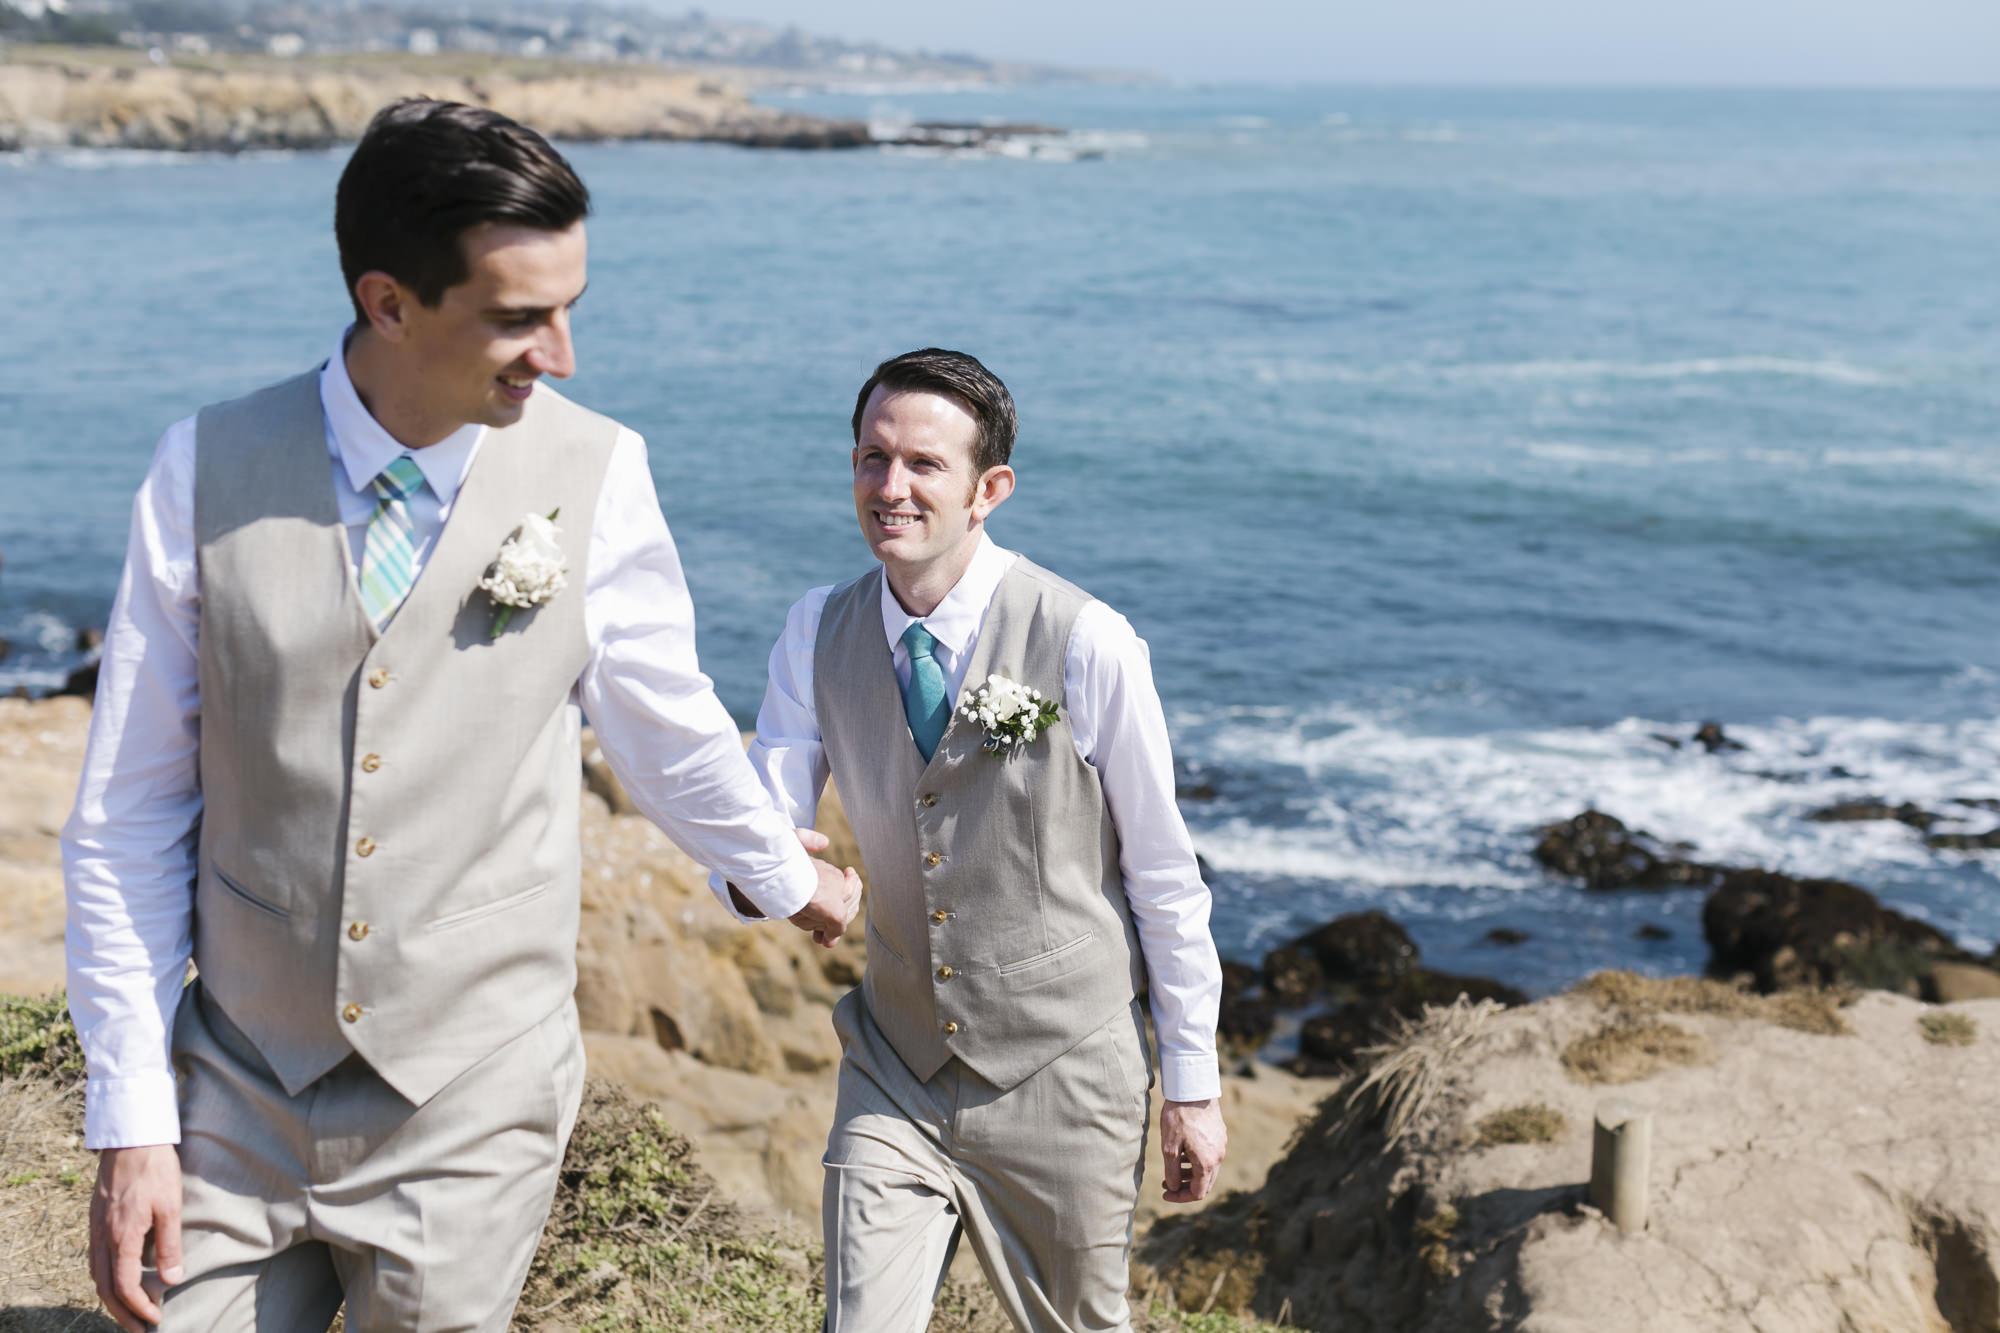 Same sex wedding couple walk together along the coast of Cambria